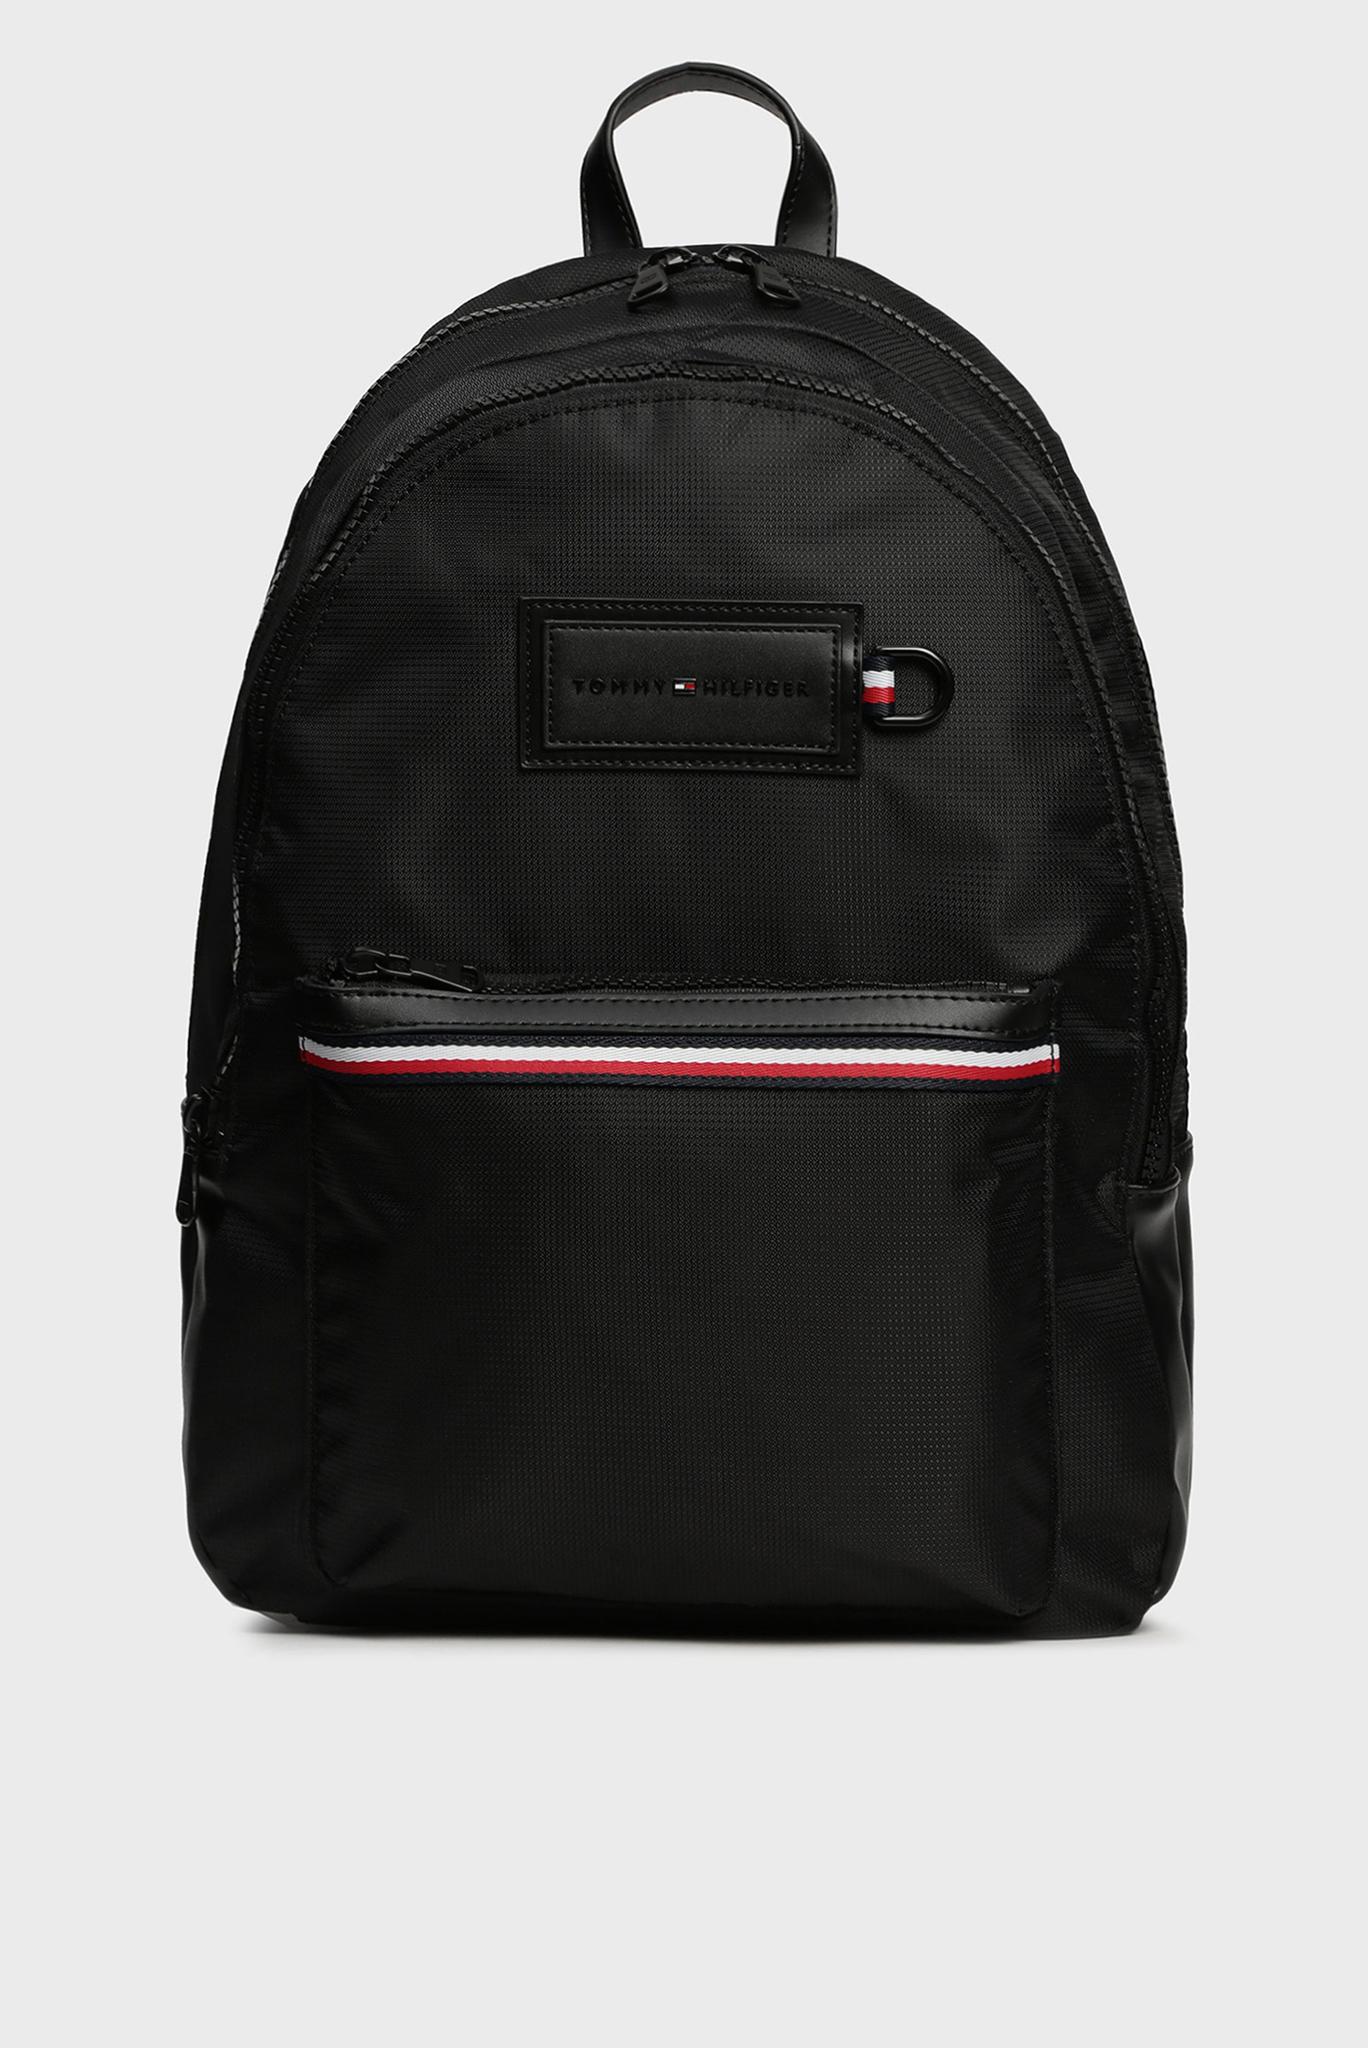 Мужской черный рюкзак MODERN Tommy Hilfiger